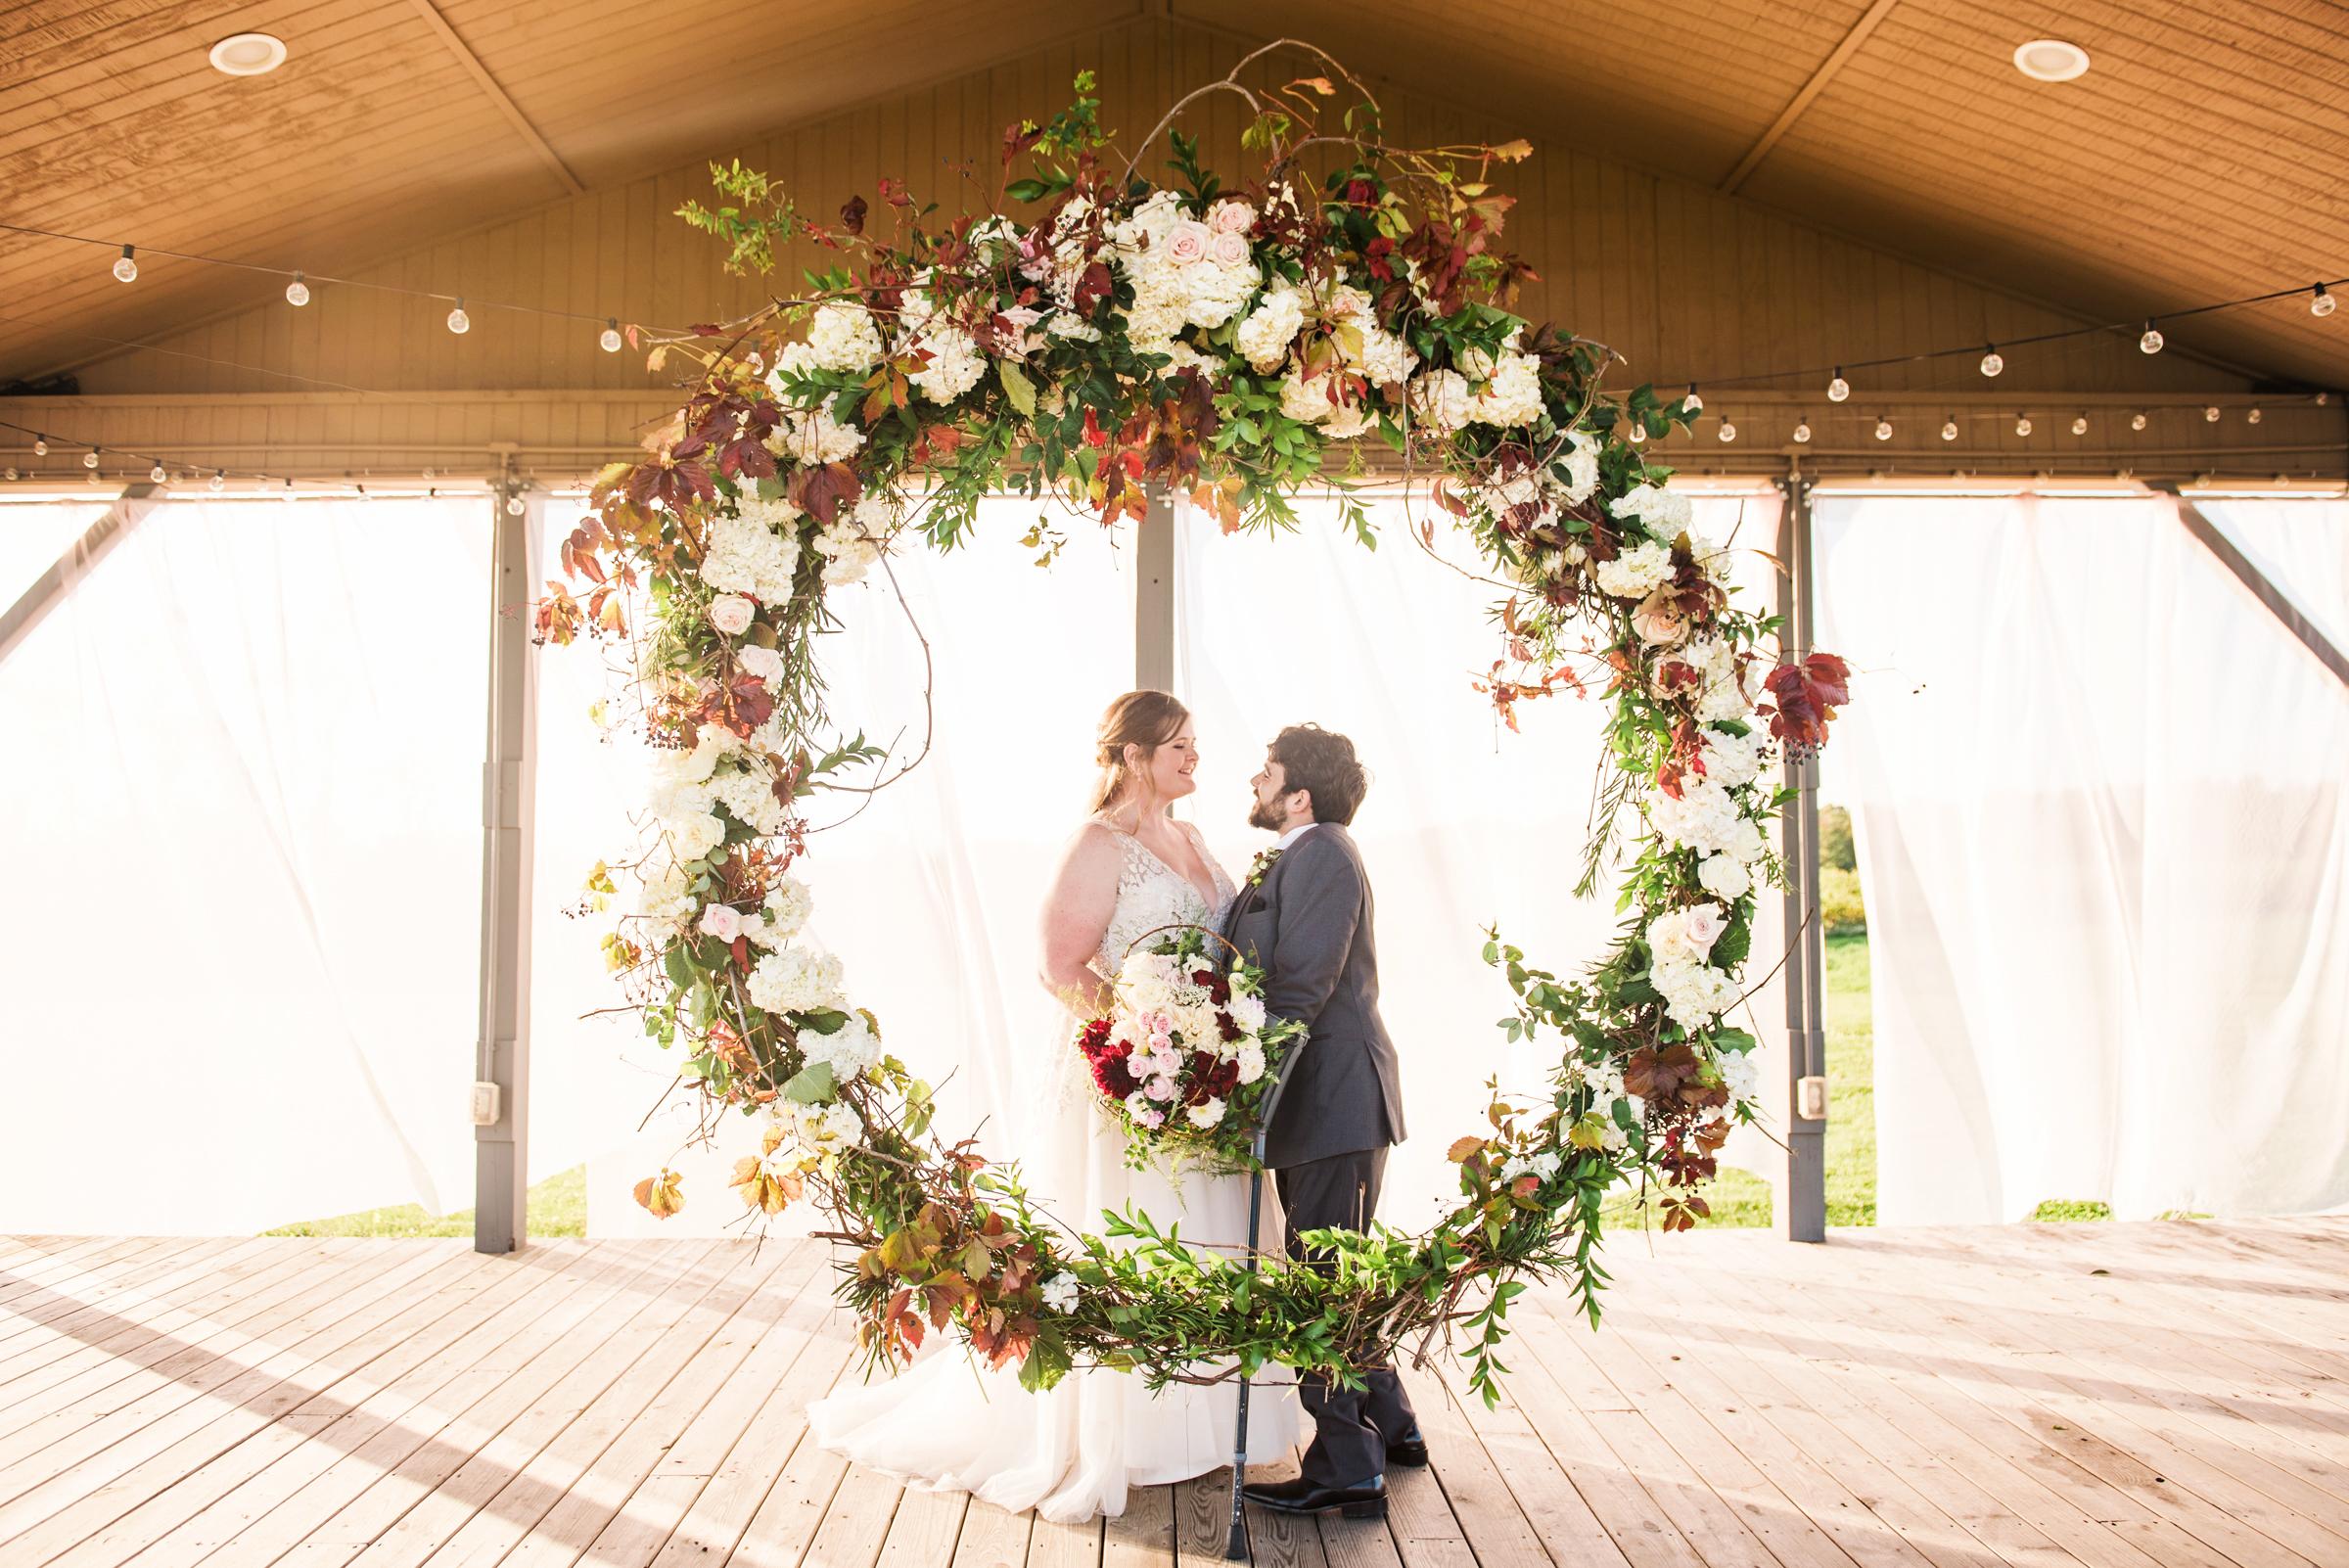 Zugibe_Vineyards_Finger_Lakes_Wedding_JILL_STUDIO_Rochester_NY_Photographer_DSC_4078.jpg